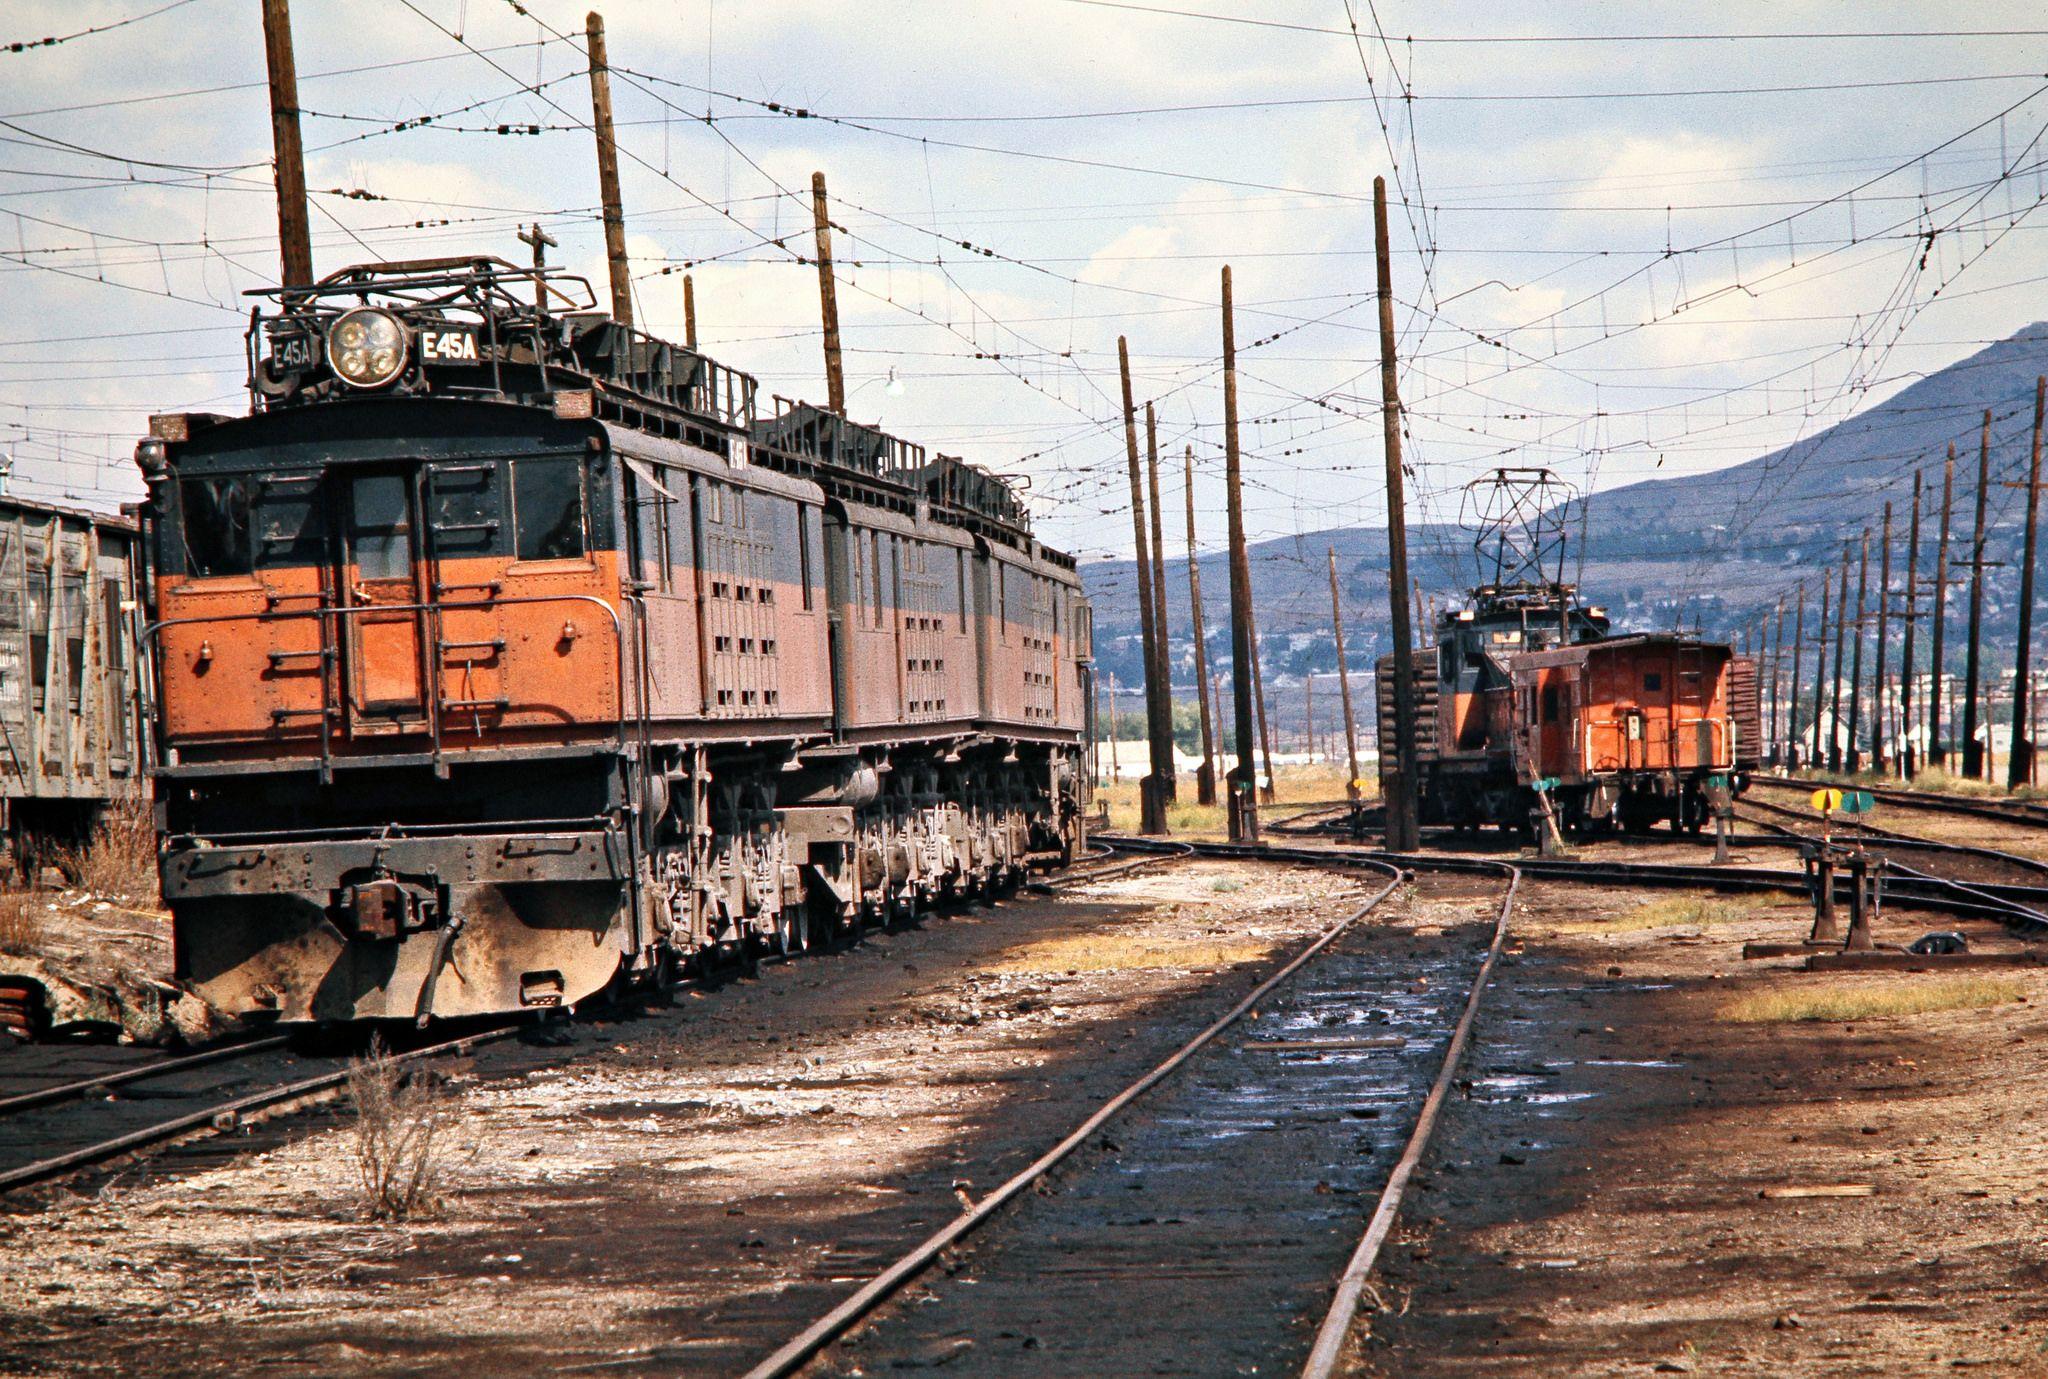 fc485ff2afac243a189399e4e9559eaa - Electric Railroad through the Rockies